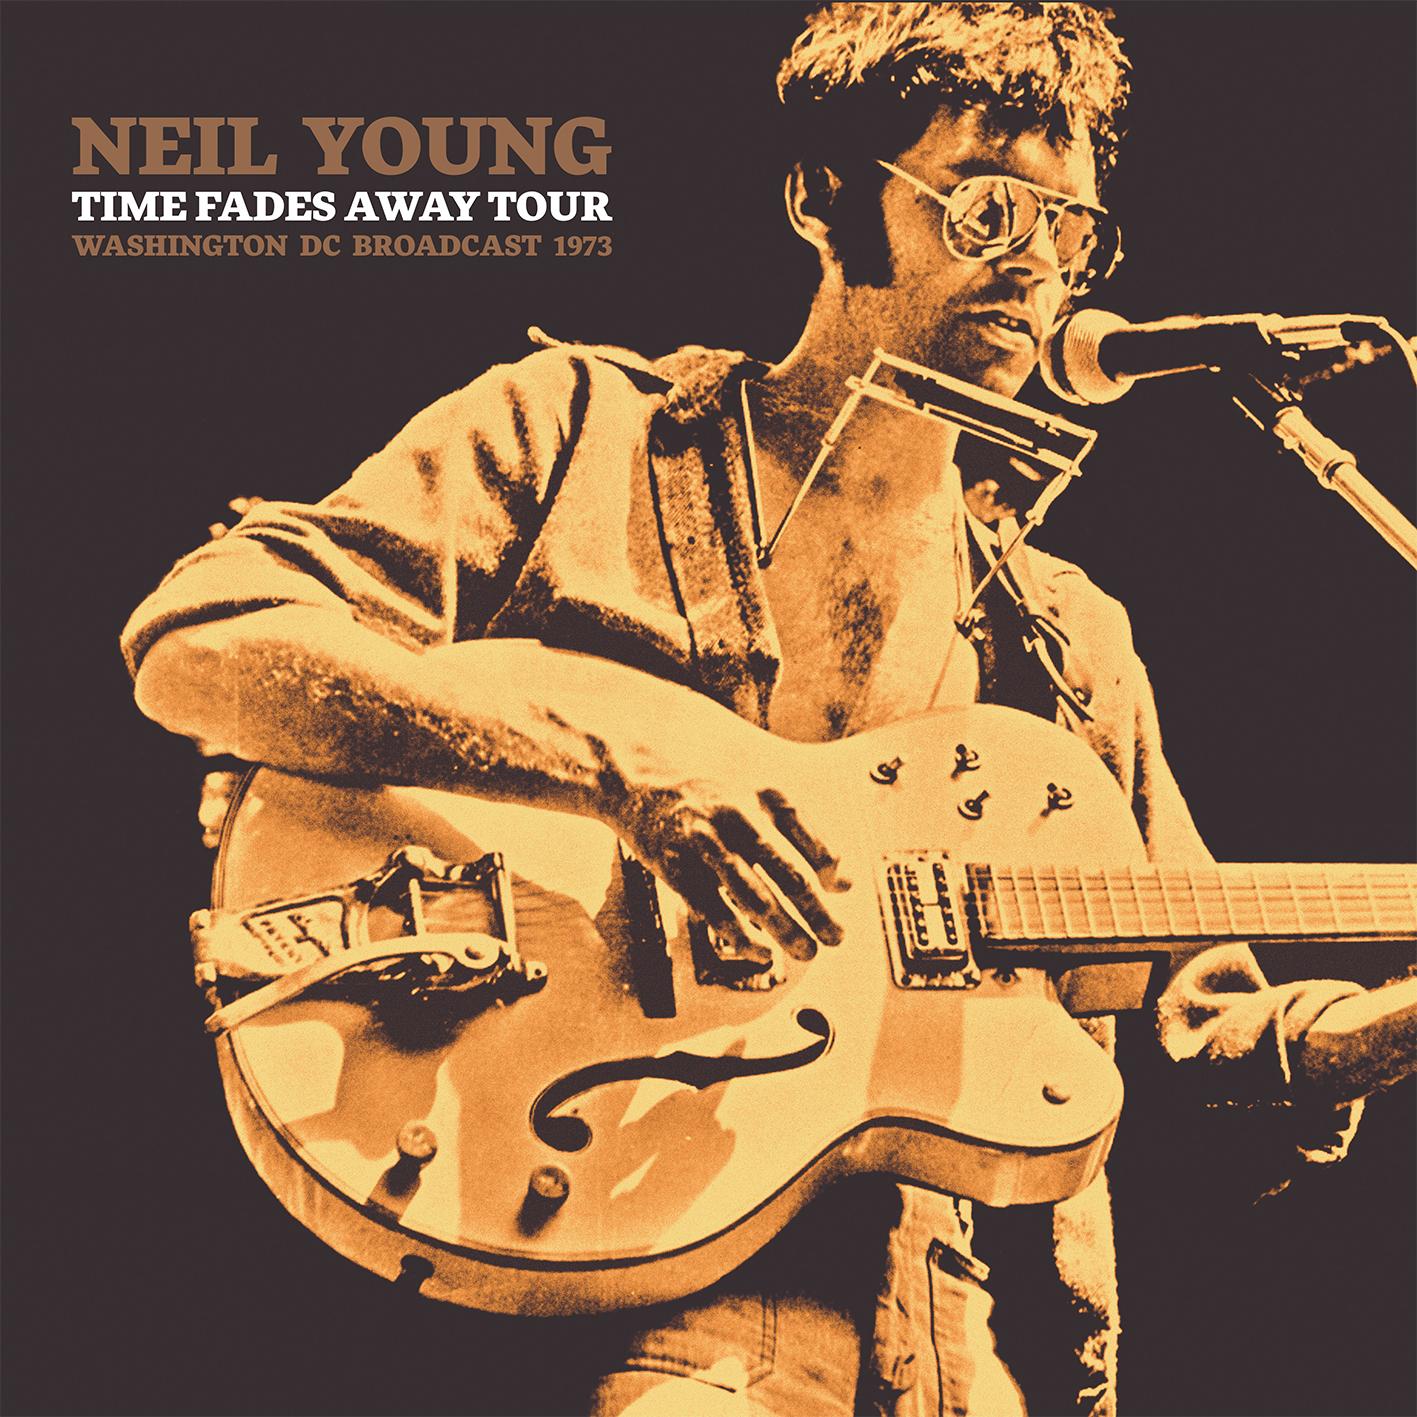 Neil Young - Time Fades Away Tour [2xLP]